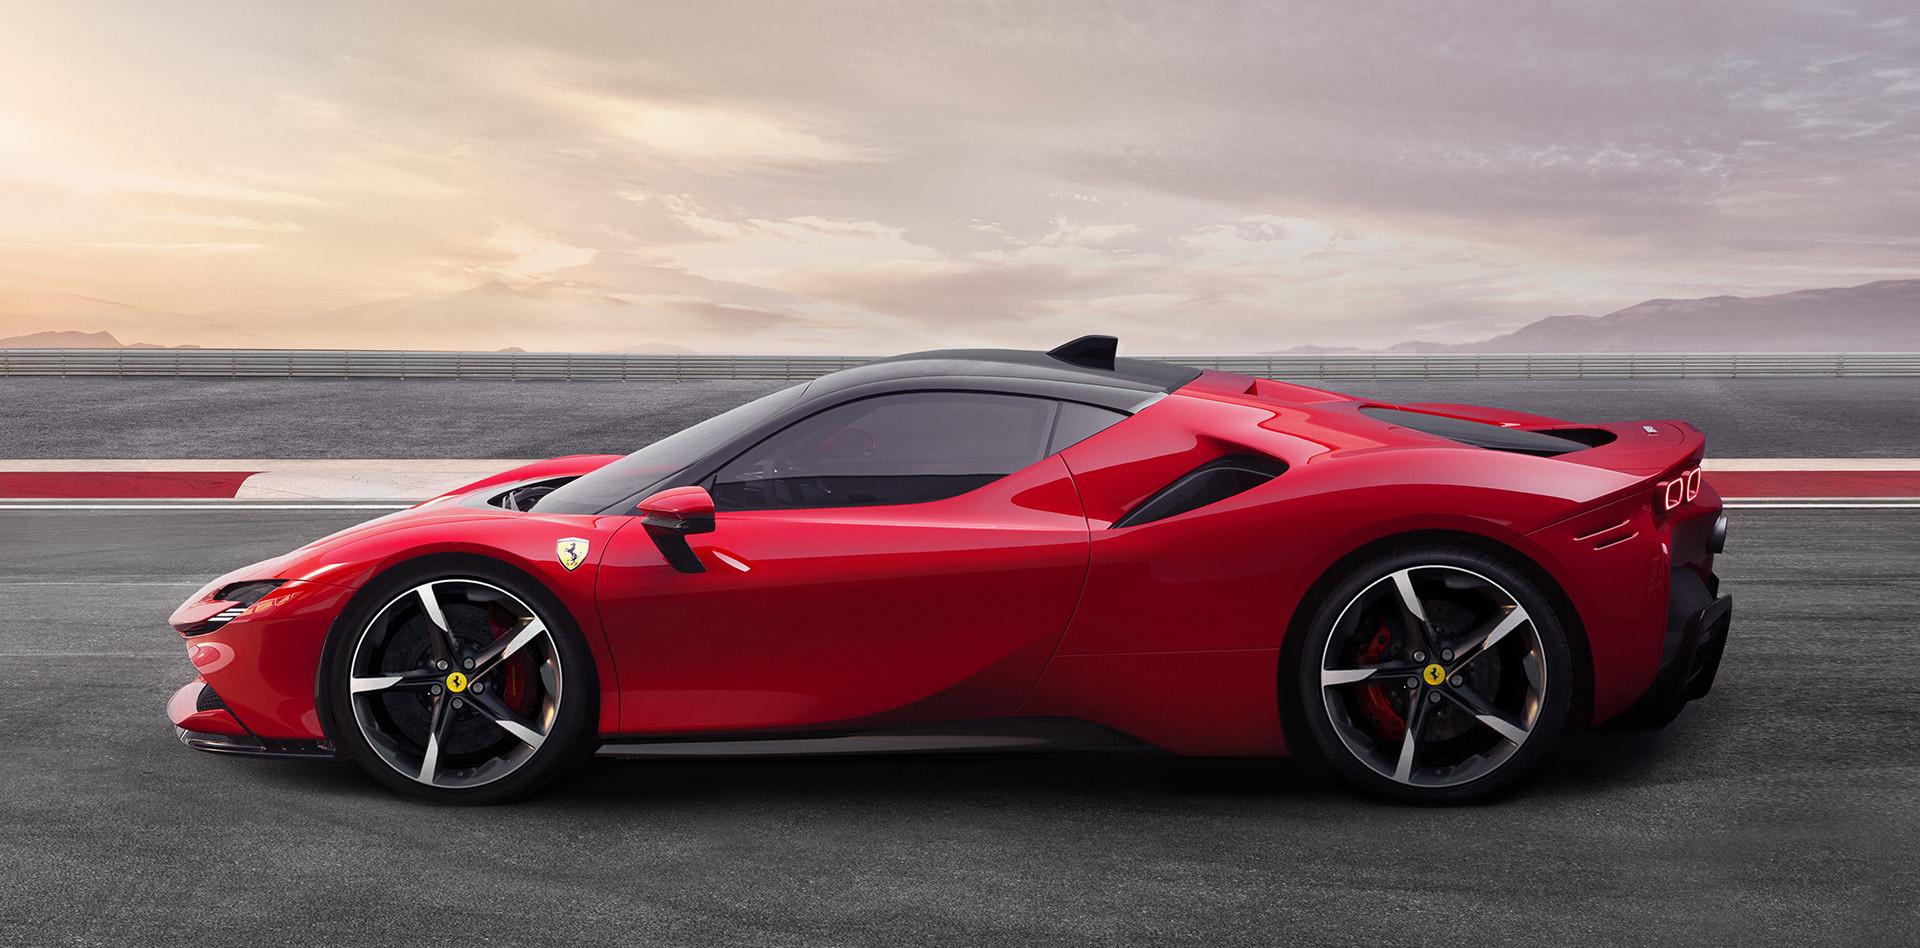 Ferrari Beverly Hills